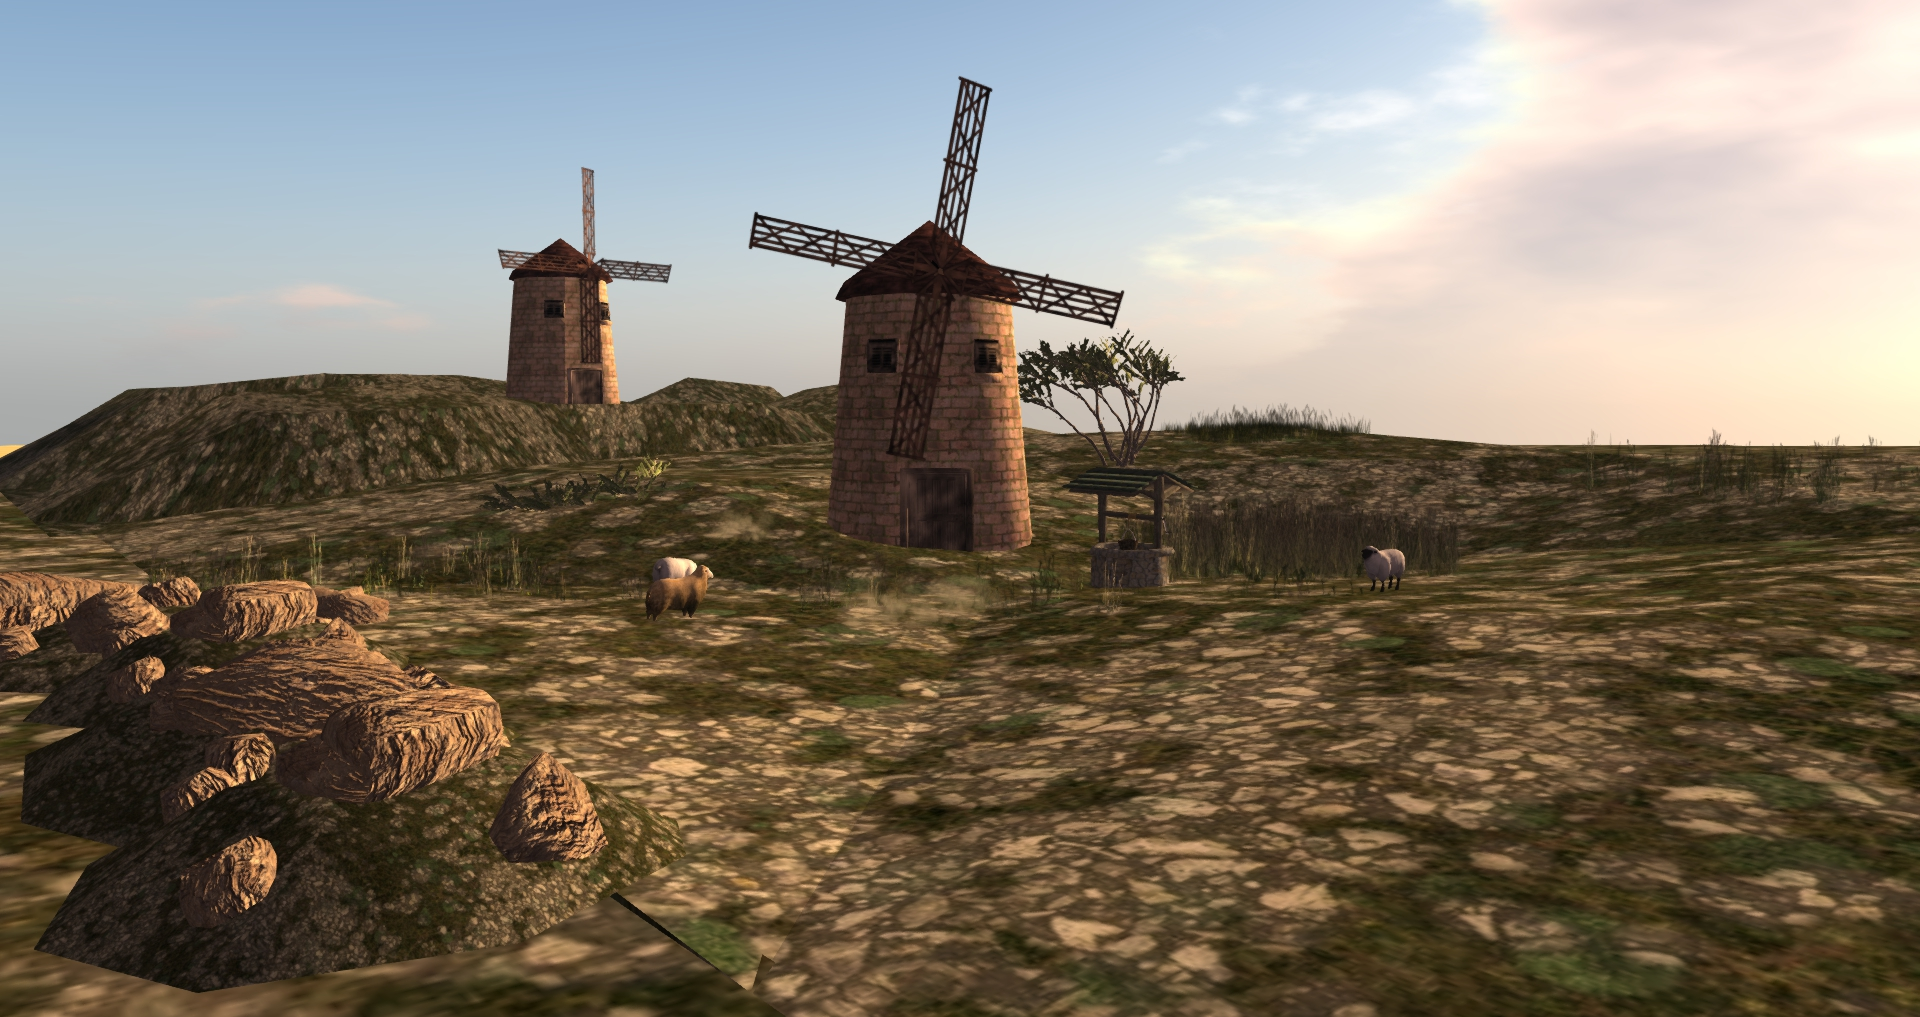 Chasing Windmills2